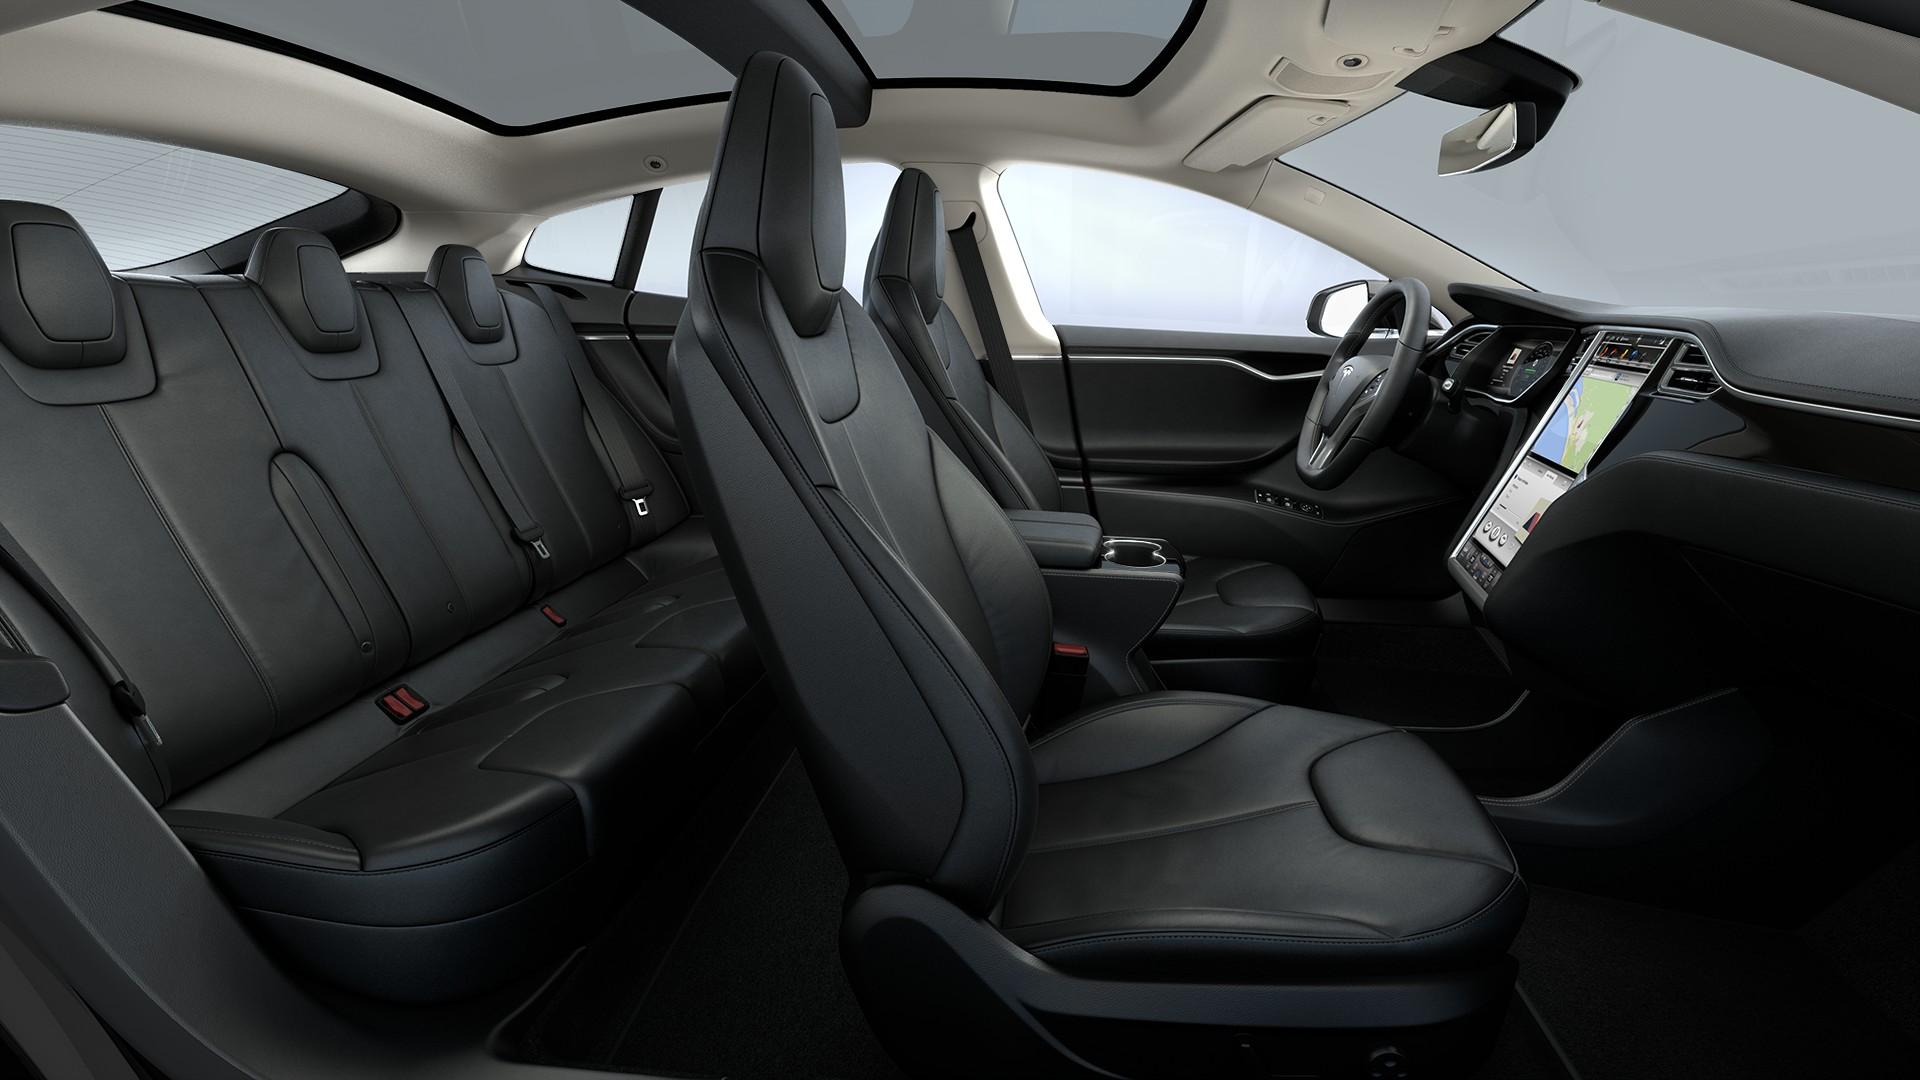 Interieur Rear Facing Seats Black Nappa Leather Seats Piano Black Decor Standard Textile Headliner